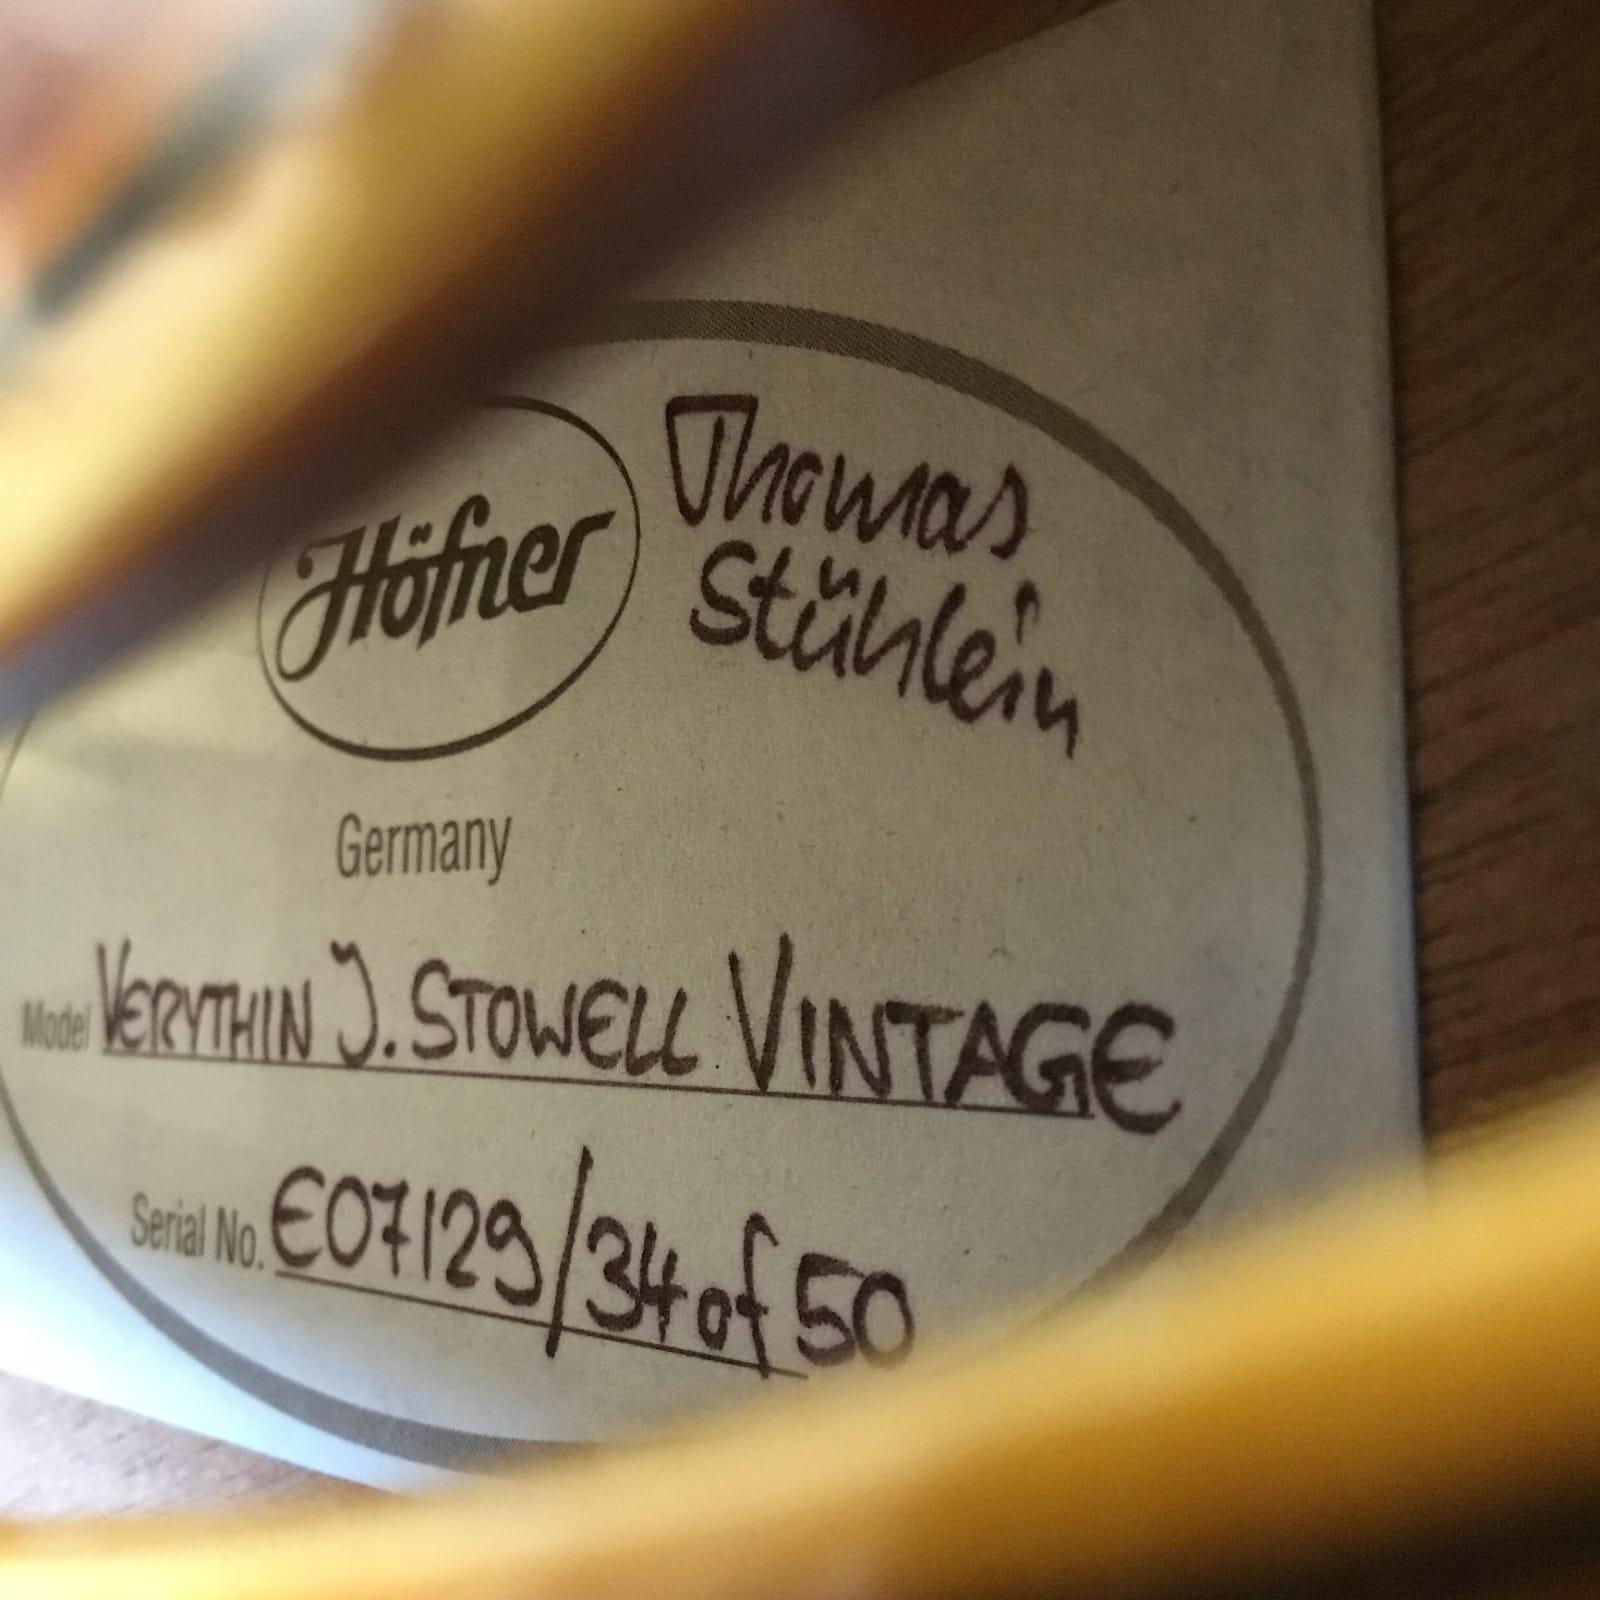 Hofner Verythin John Stowell Vintage #34/50